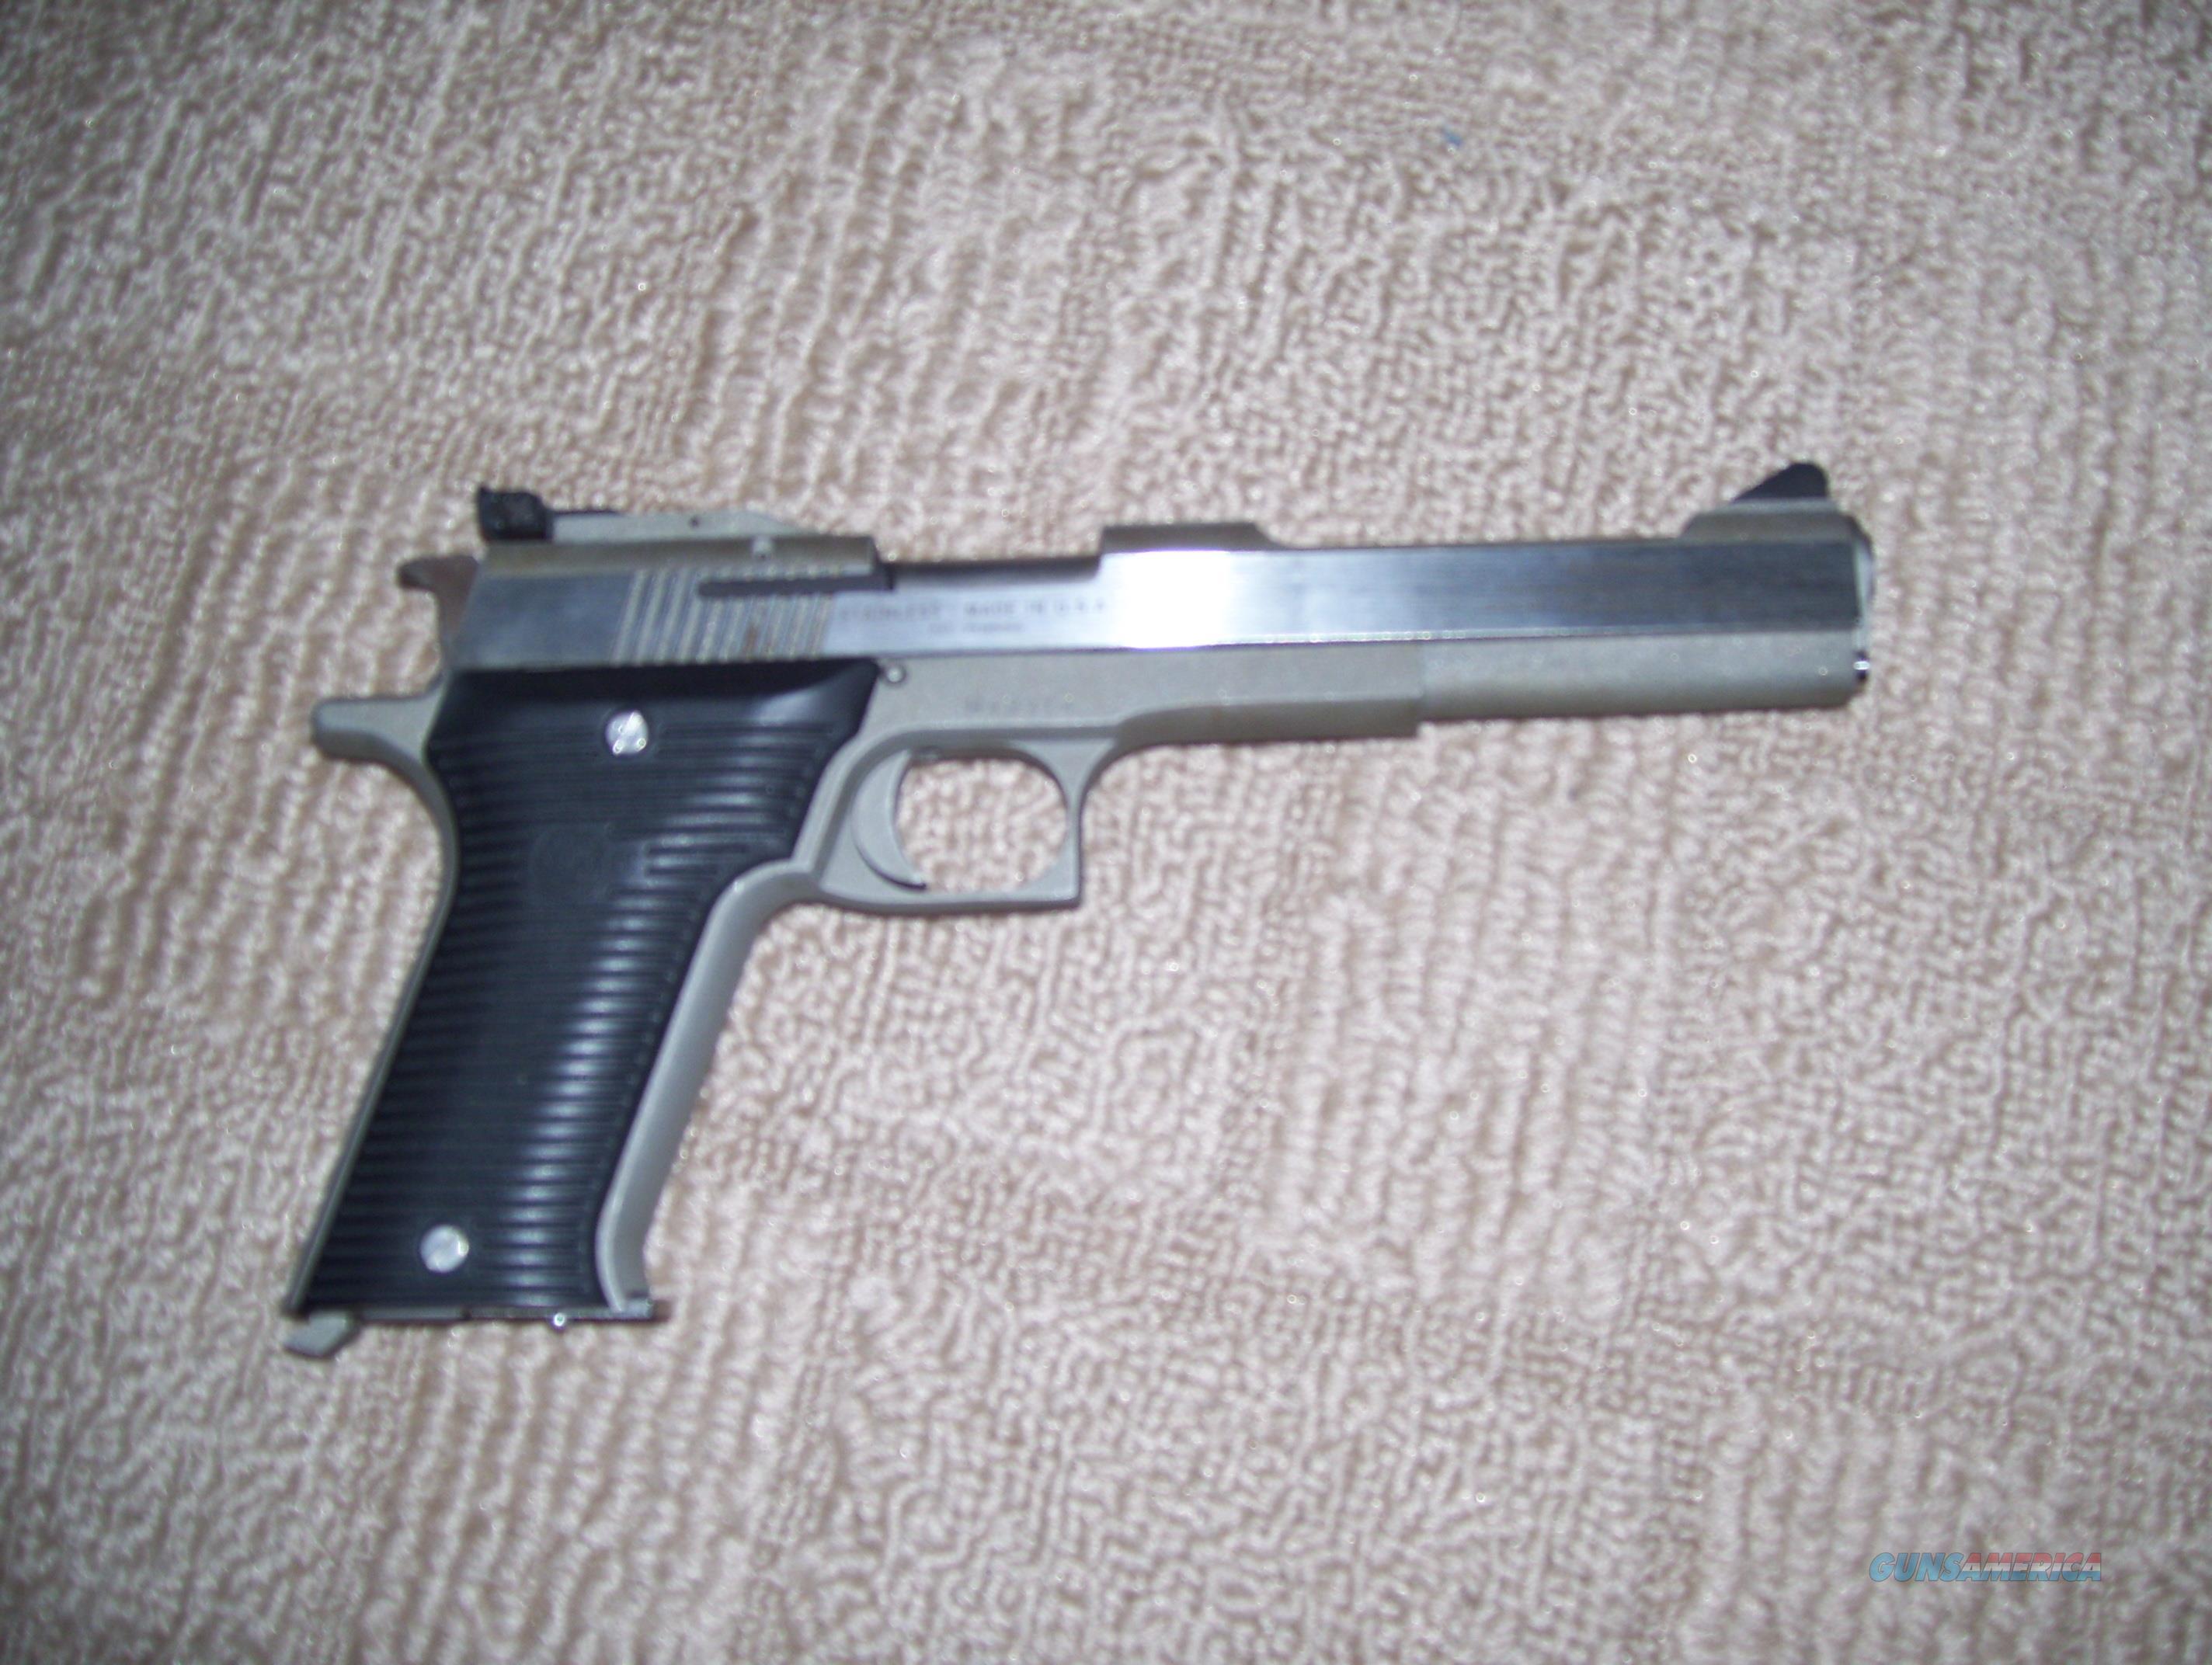 AMT AUTO-MAG II  Guns > Pistols > AMT Pistols > Other